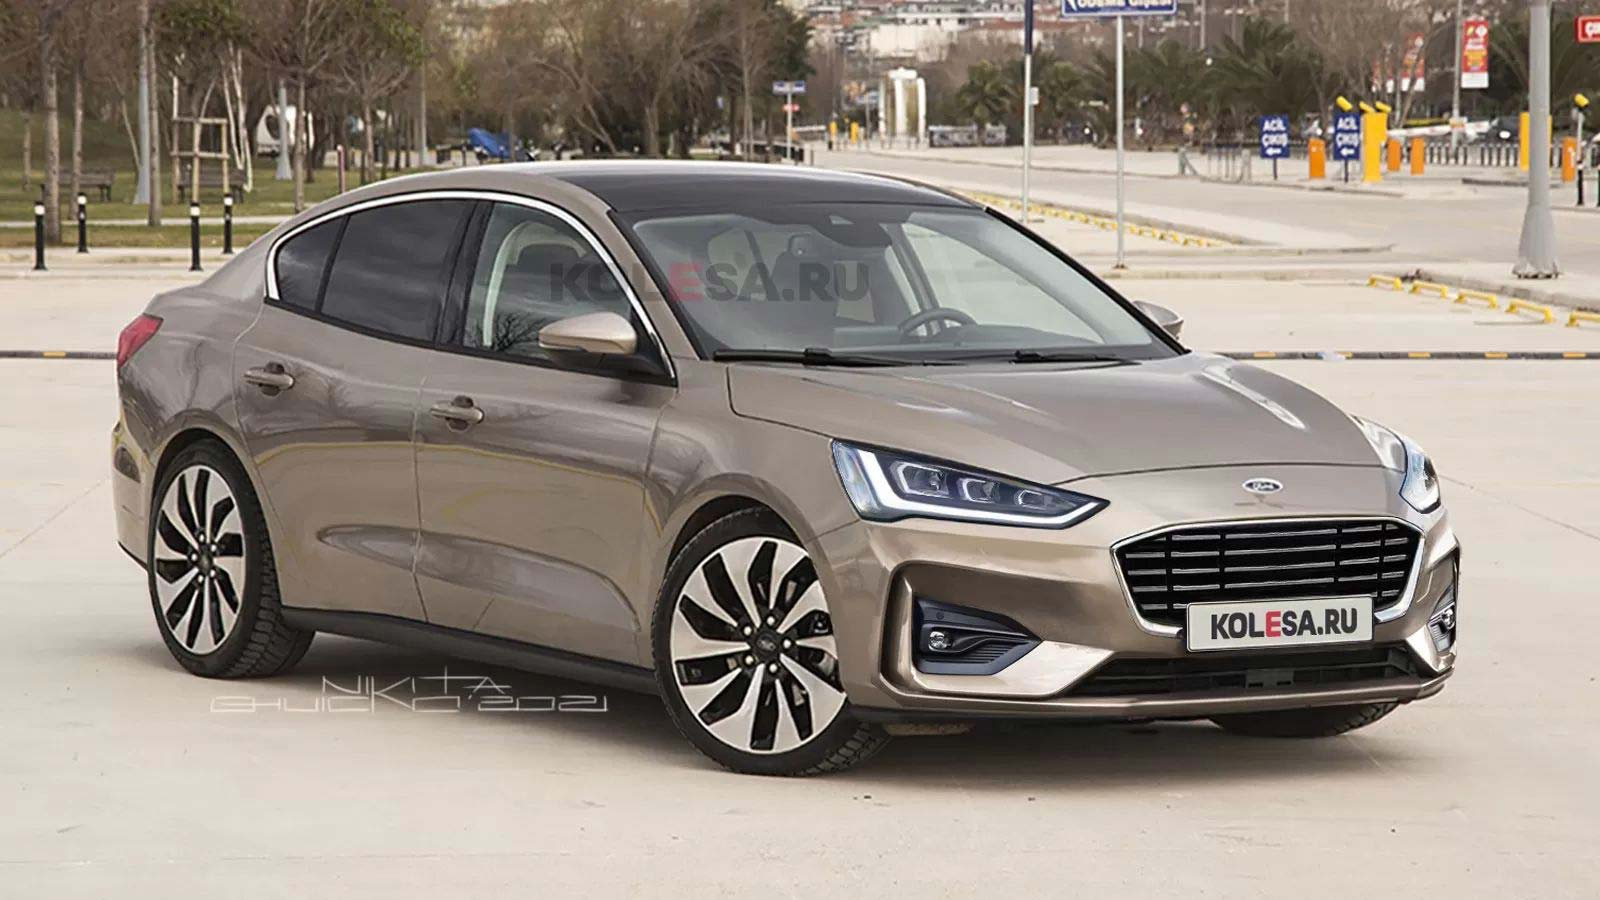 Ford Focus Sedán 2022 restyling render